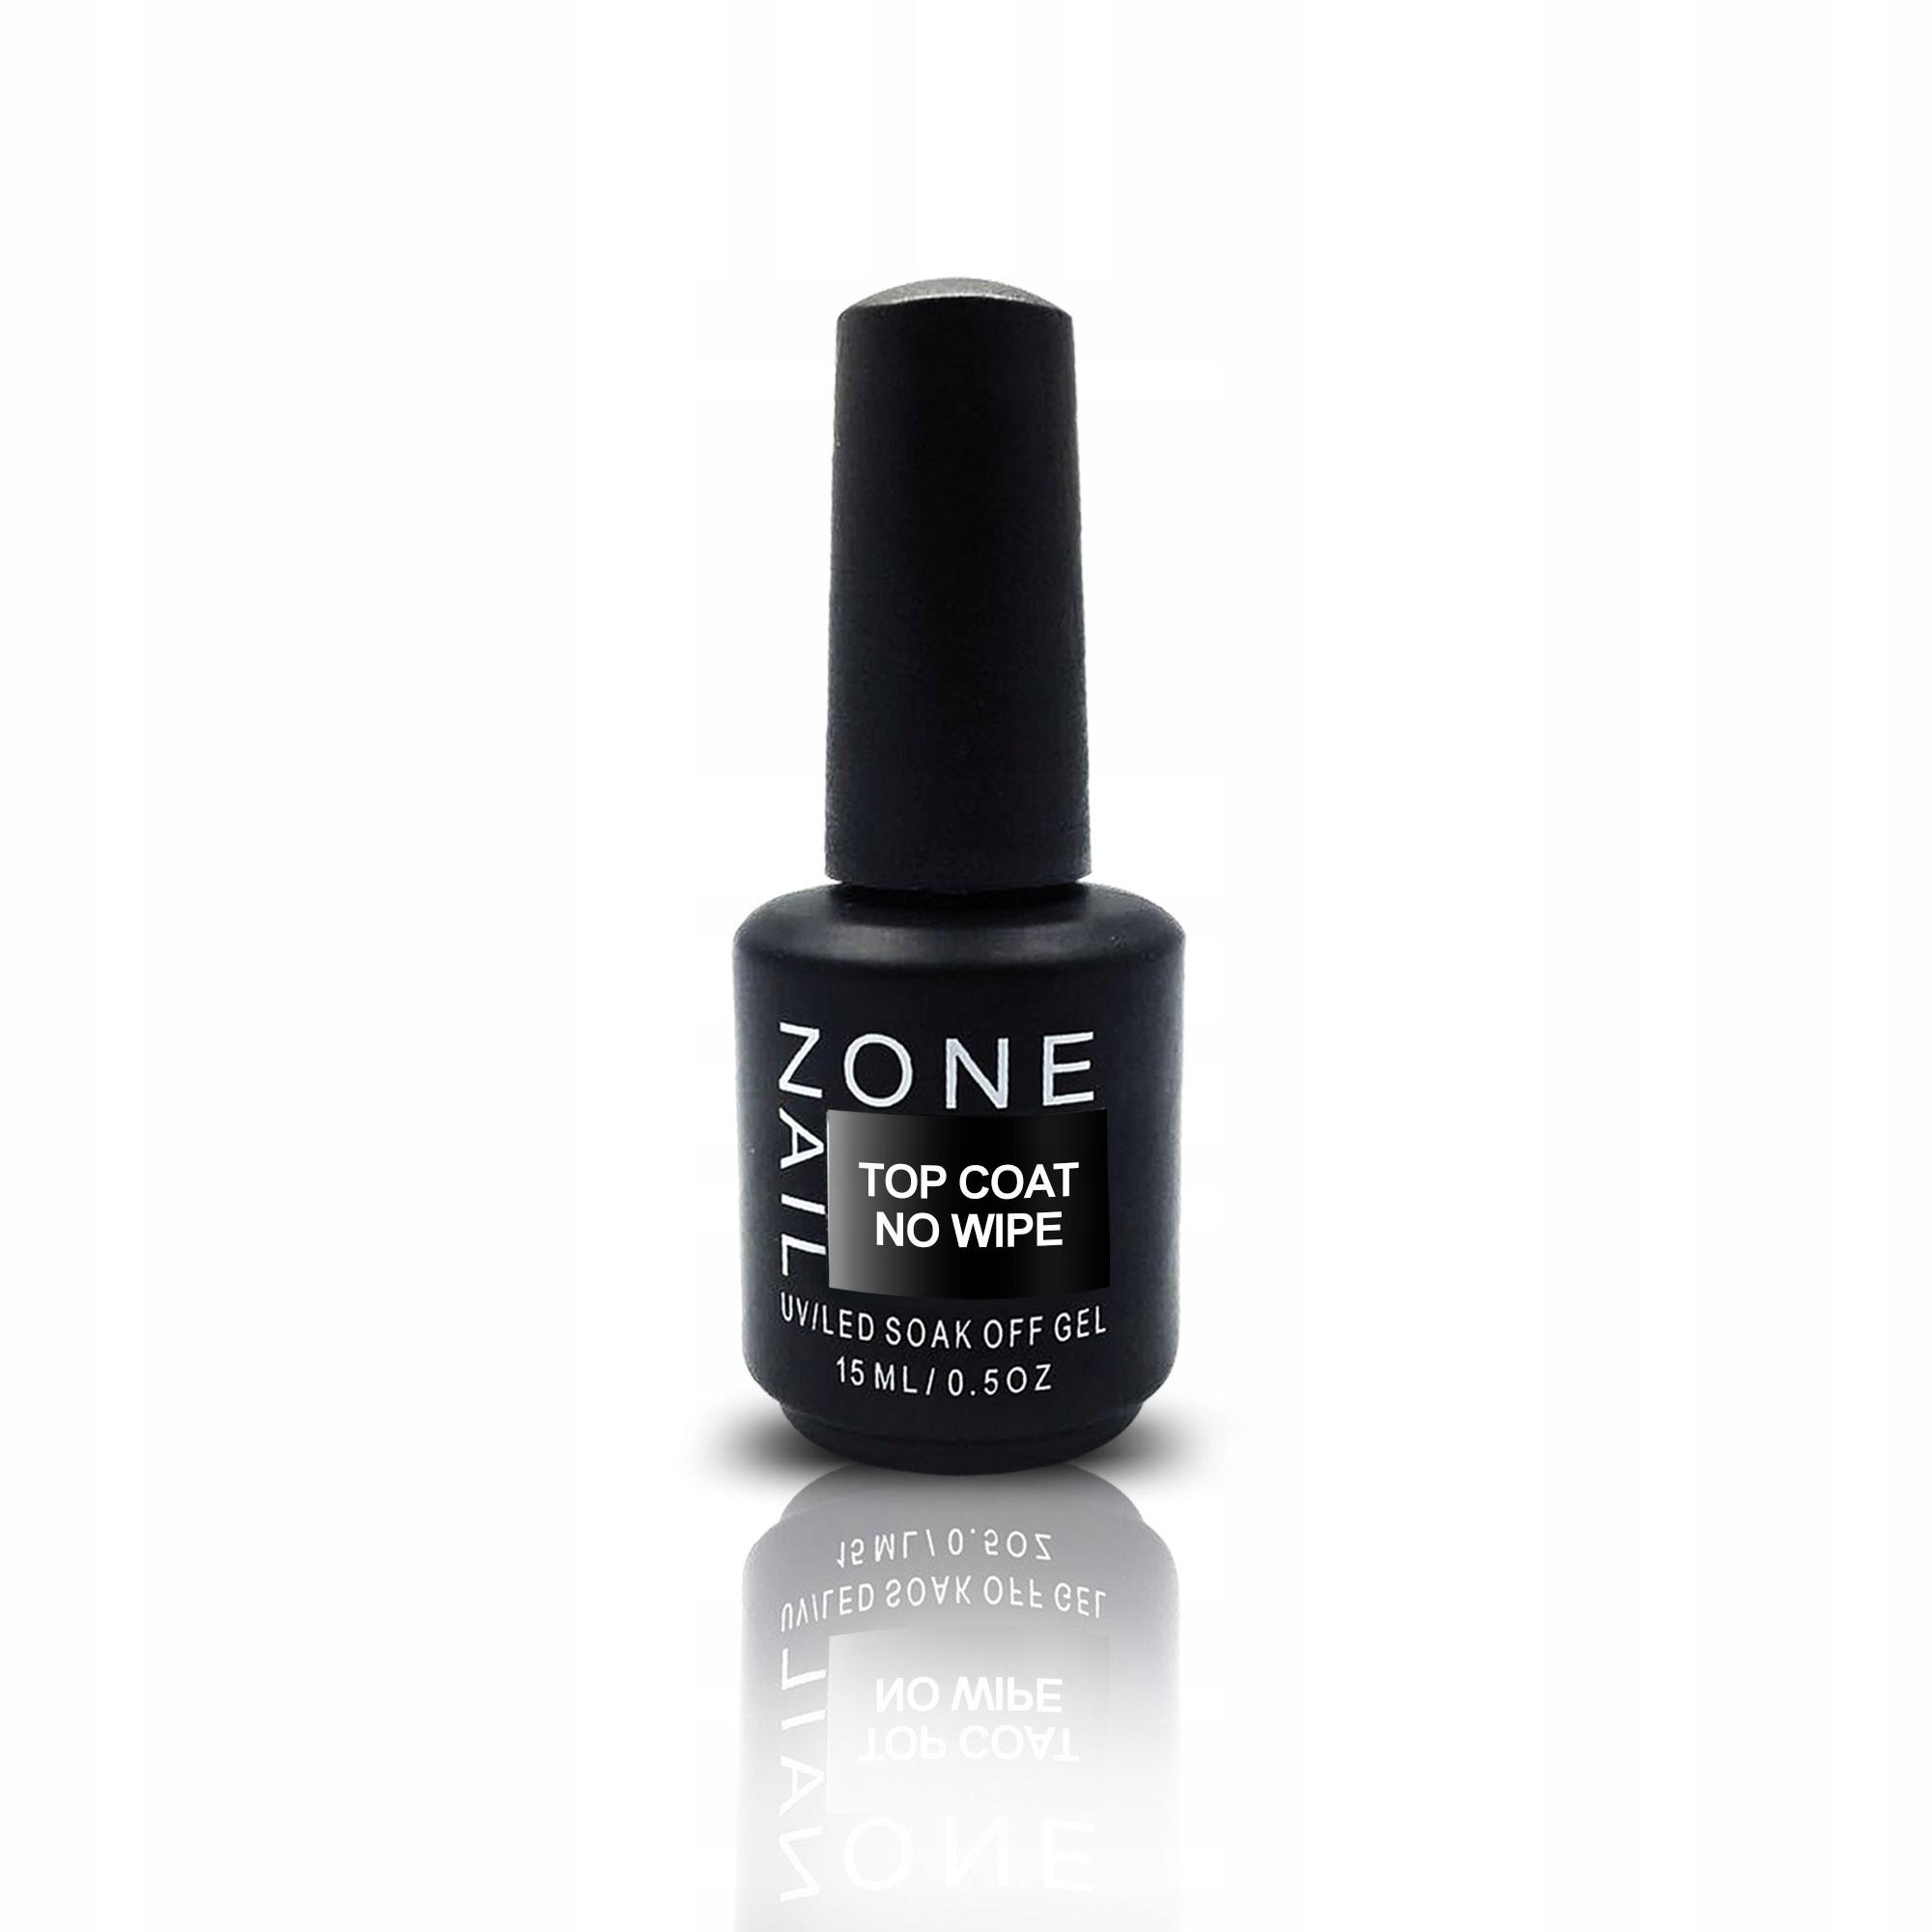 OneNail Top Coat No Wipe Hybryda manicure pedicure 9999530674 - Allegro.pl